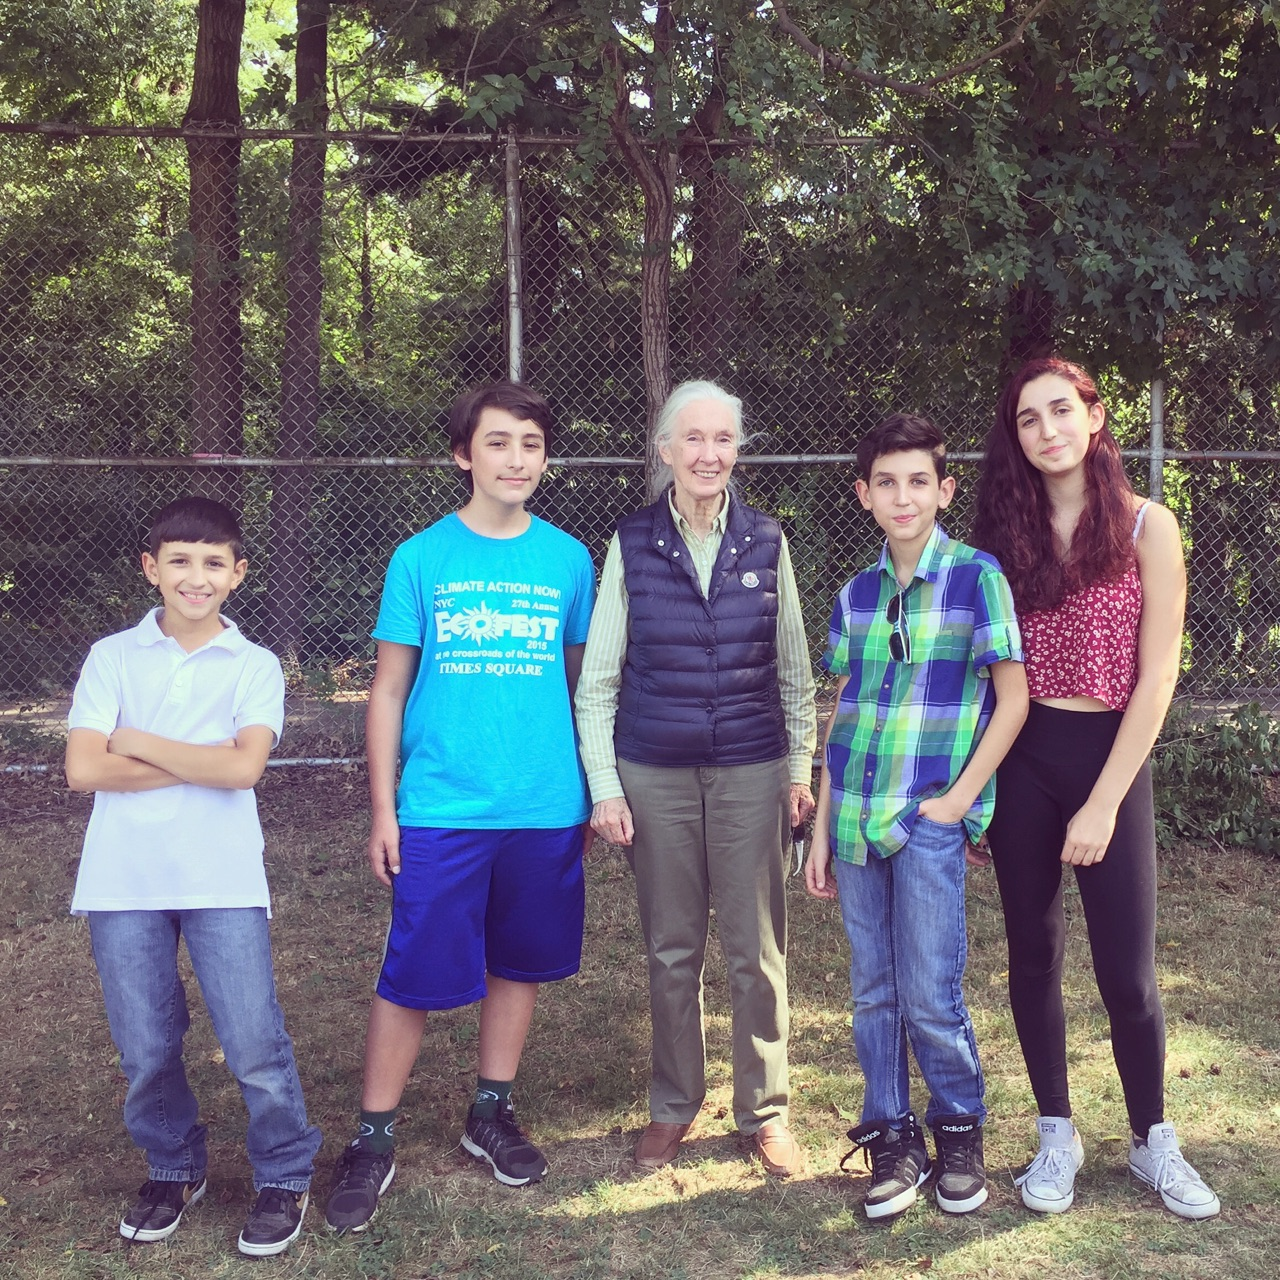 Van Cortlandt Park w/ Jane Goodall